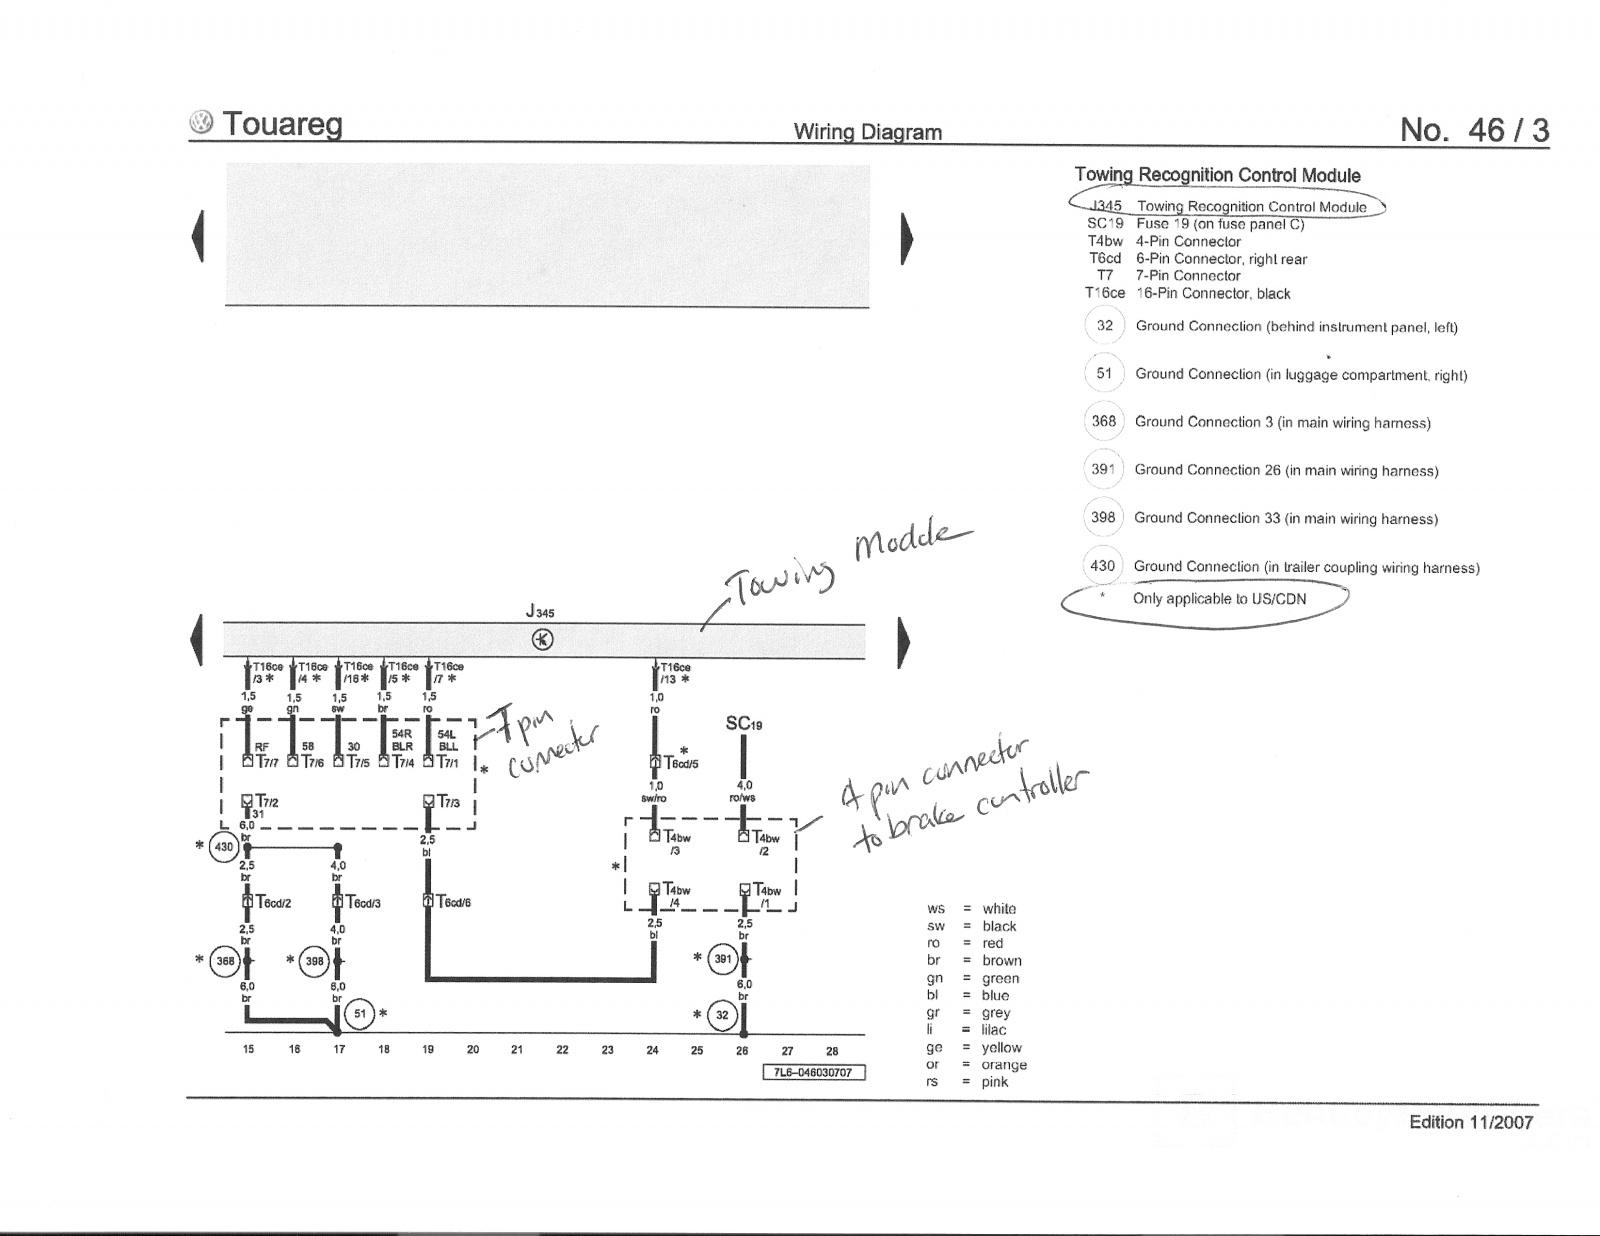 Wiring Diagram For Tow Bar Electrics Modern Design Of Horse Trailer Electric Brakes Touareg Gallery Light Brake